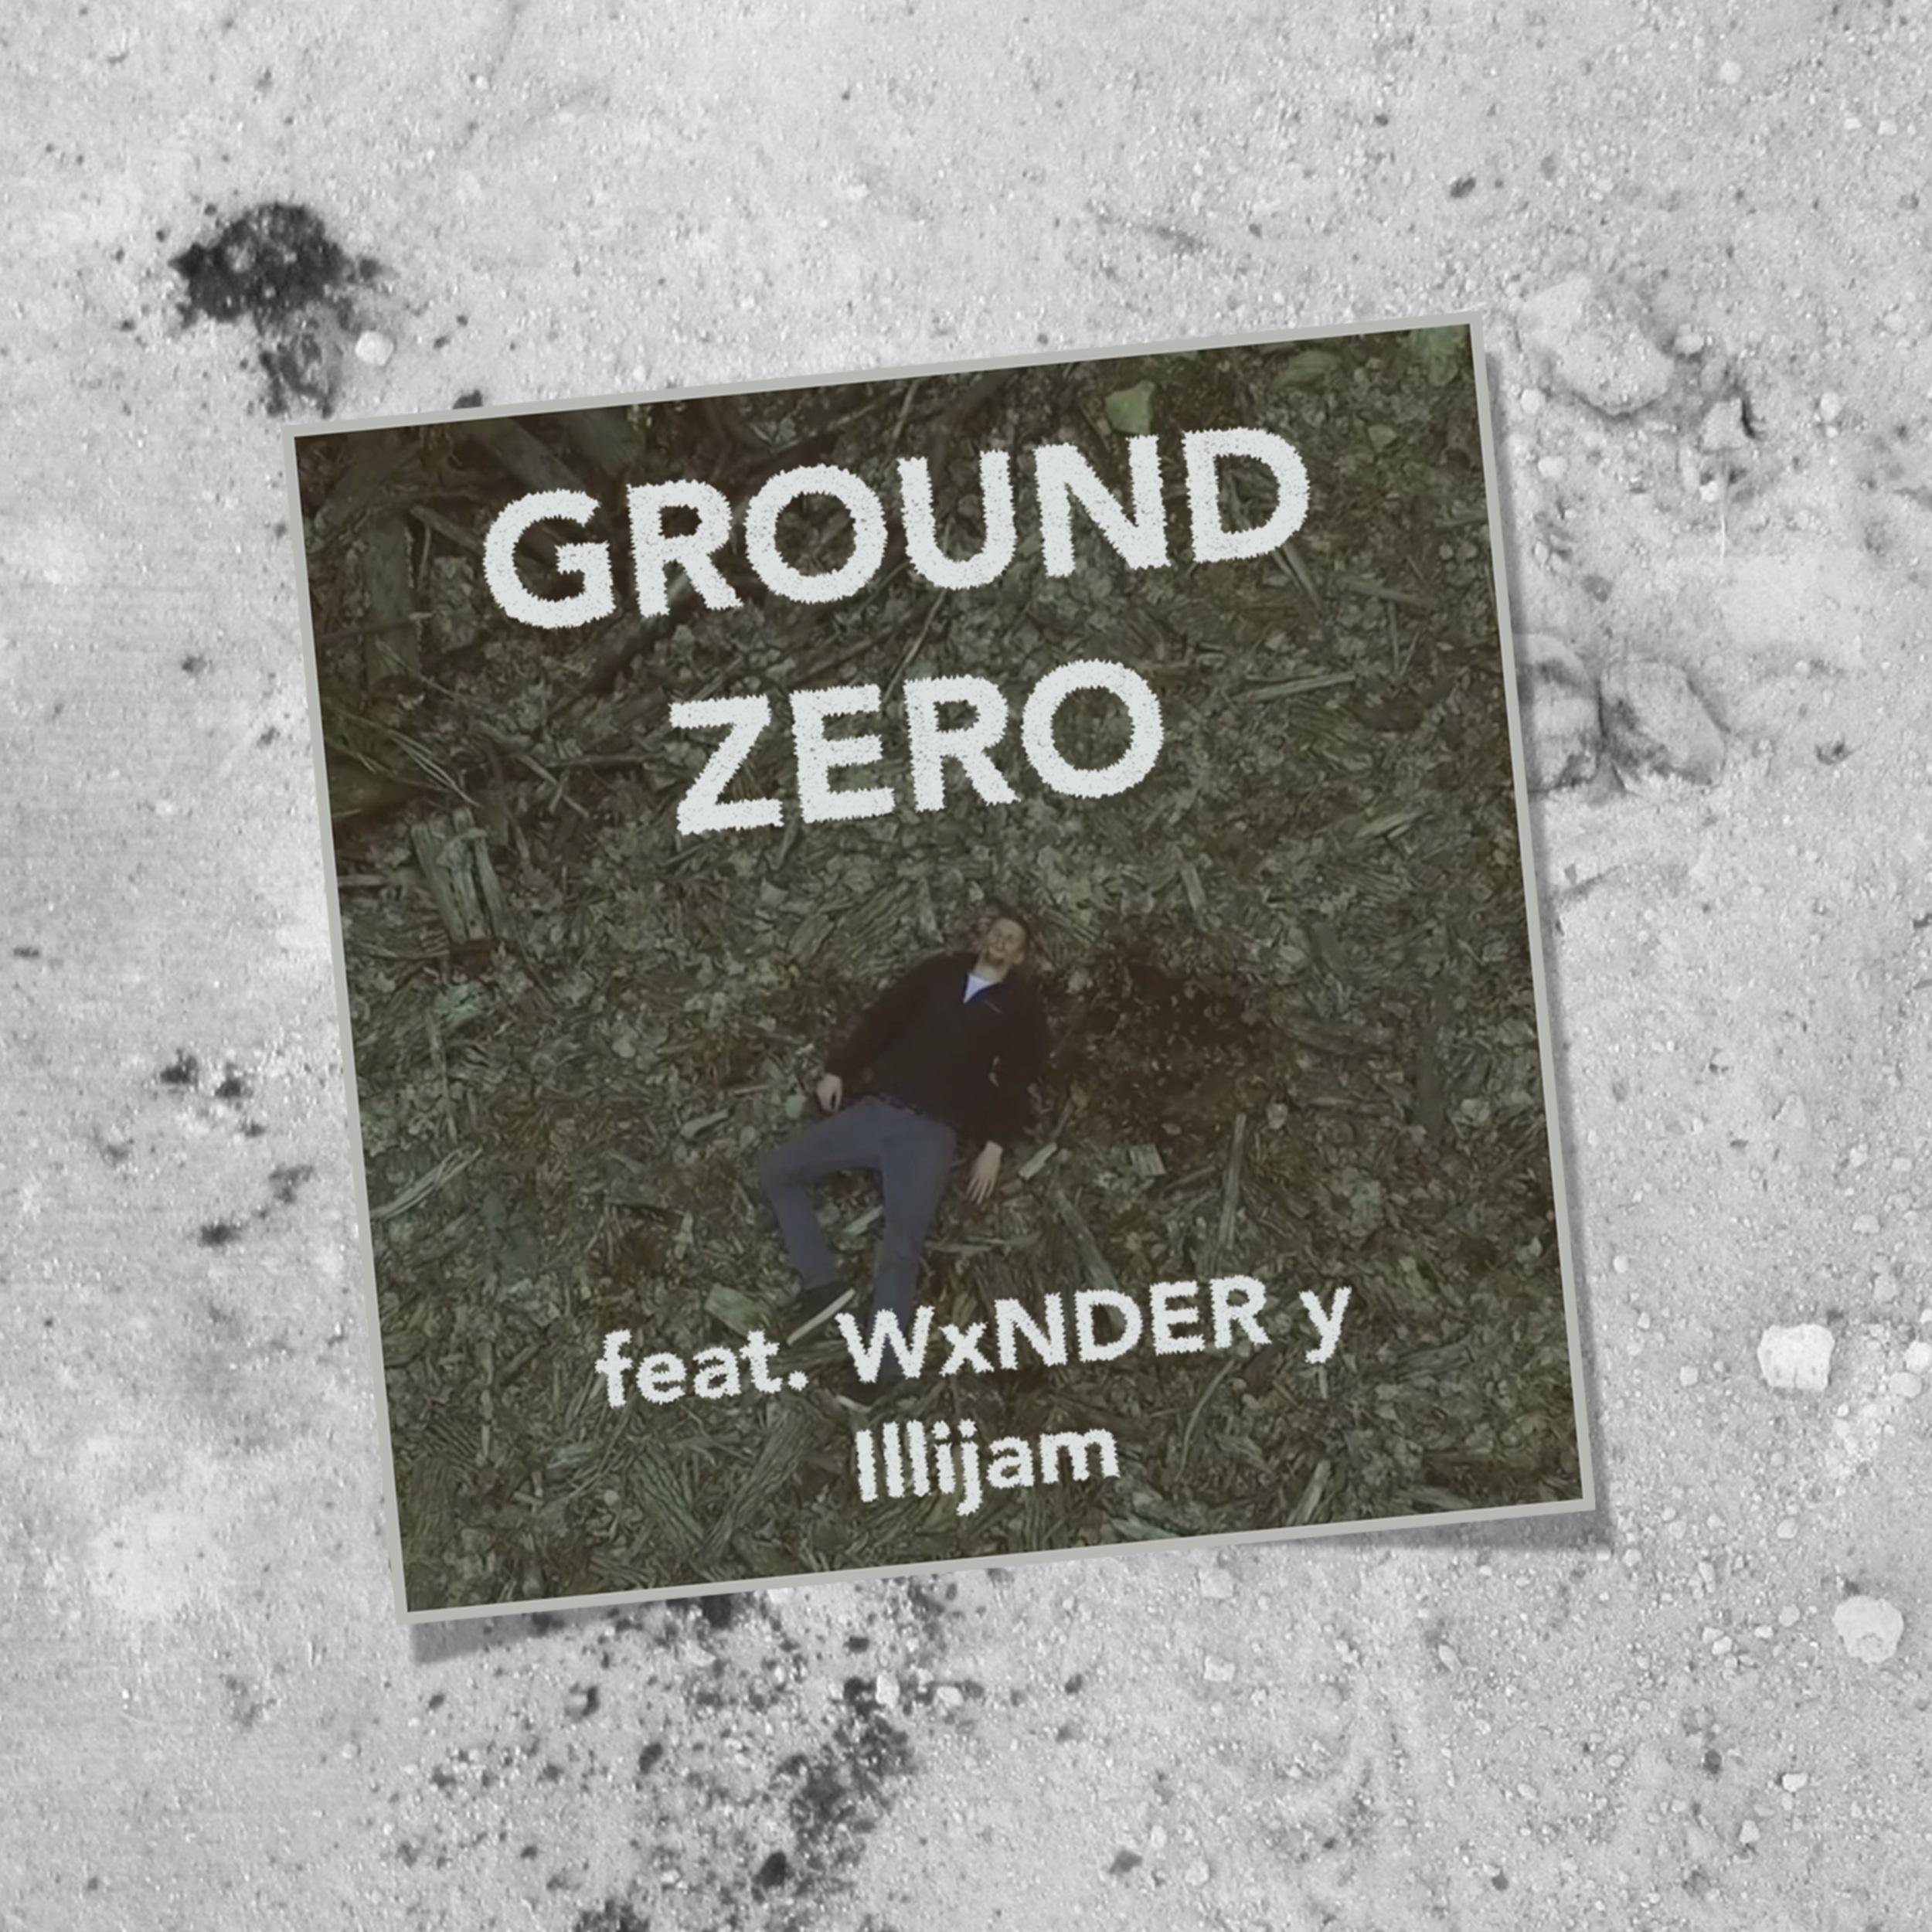 Ground Zero - Artwork - 3000x3000.jpg